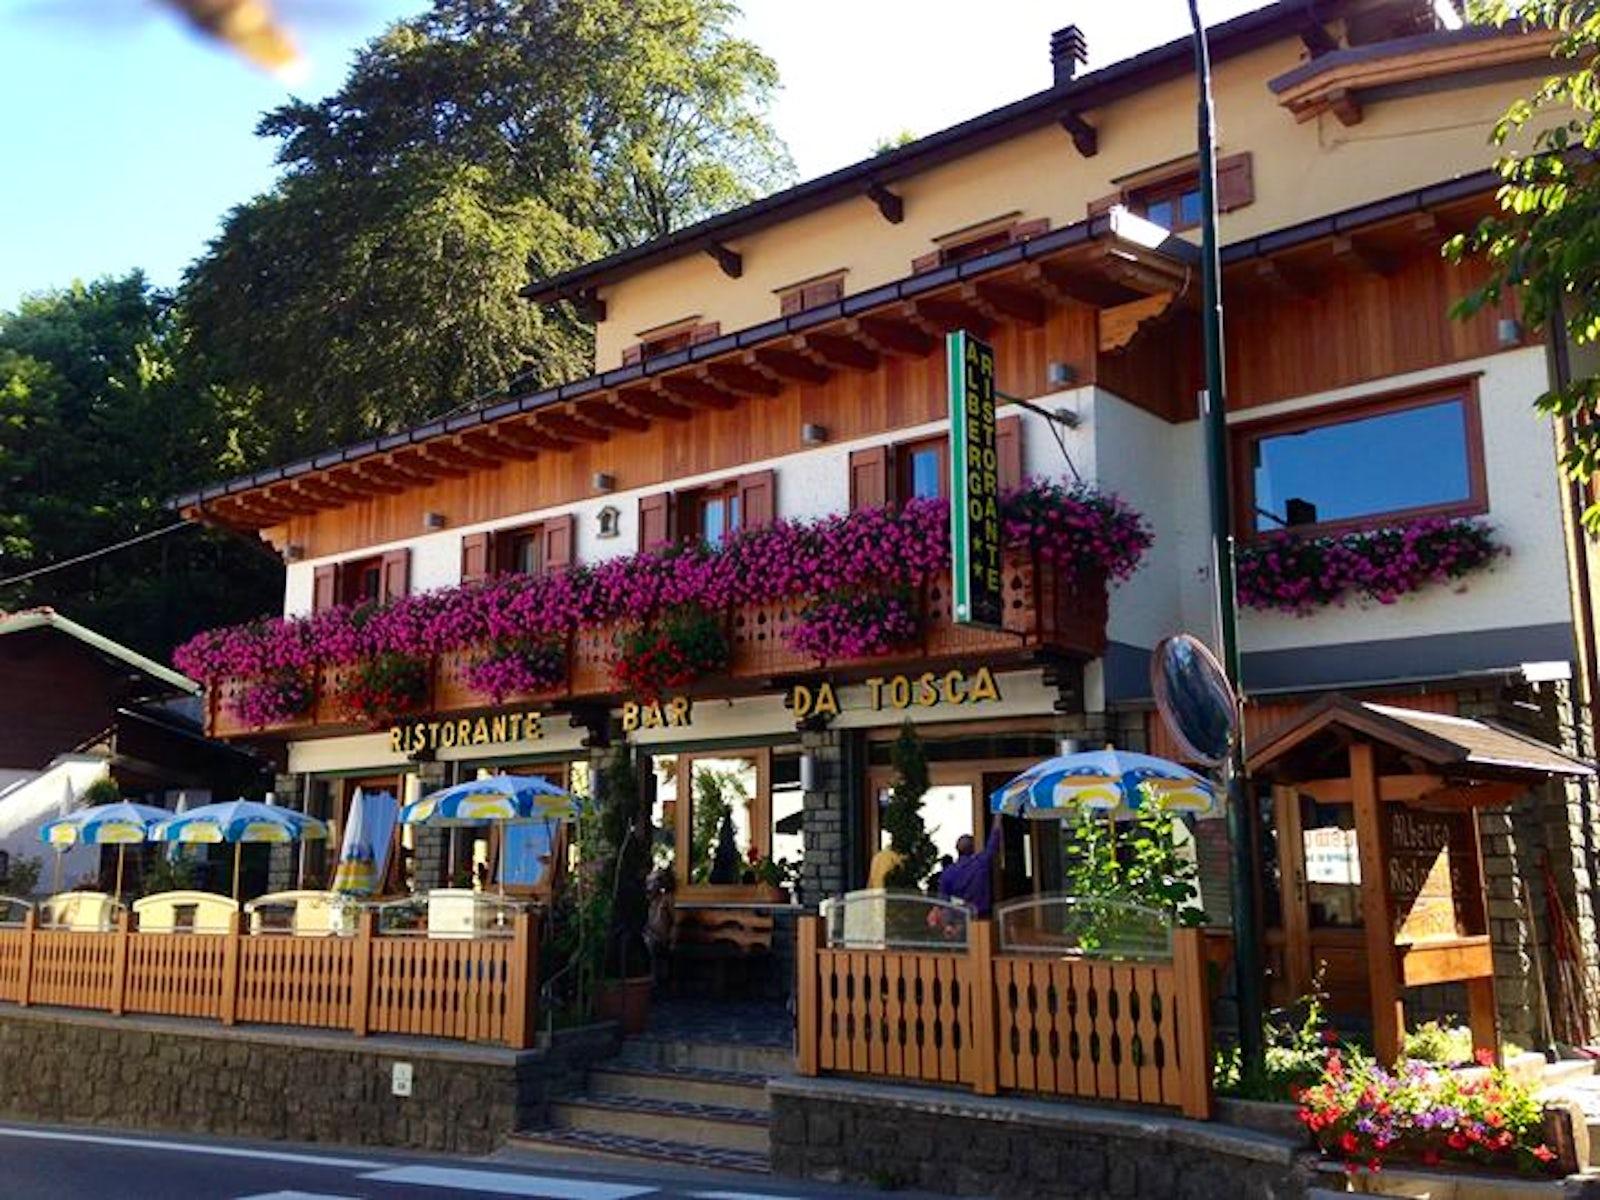 Travel inspired - Location - Albergo ristorante \